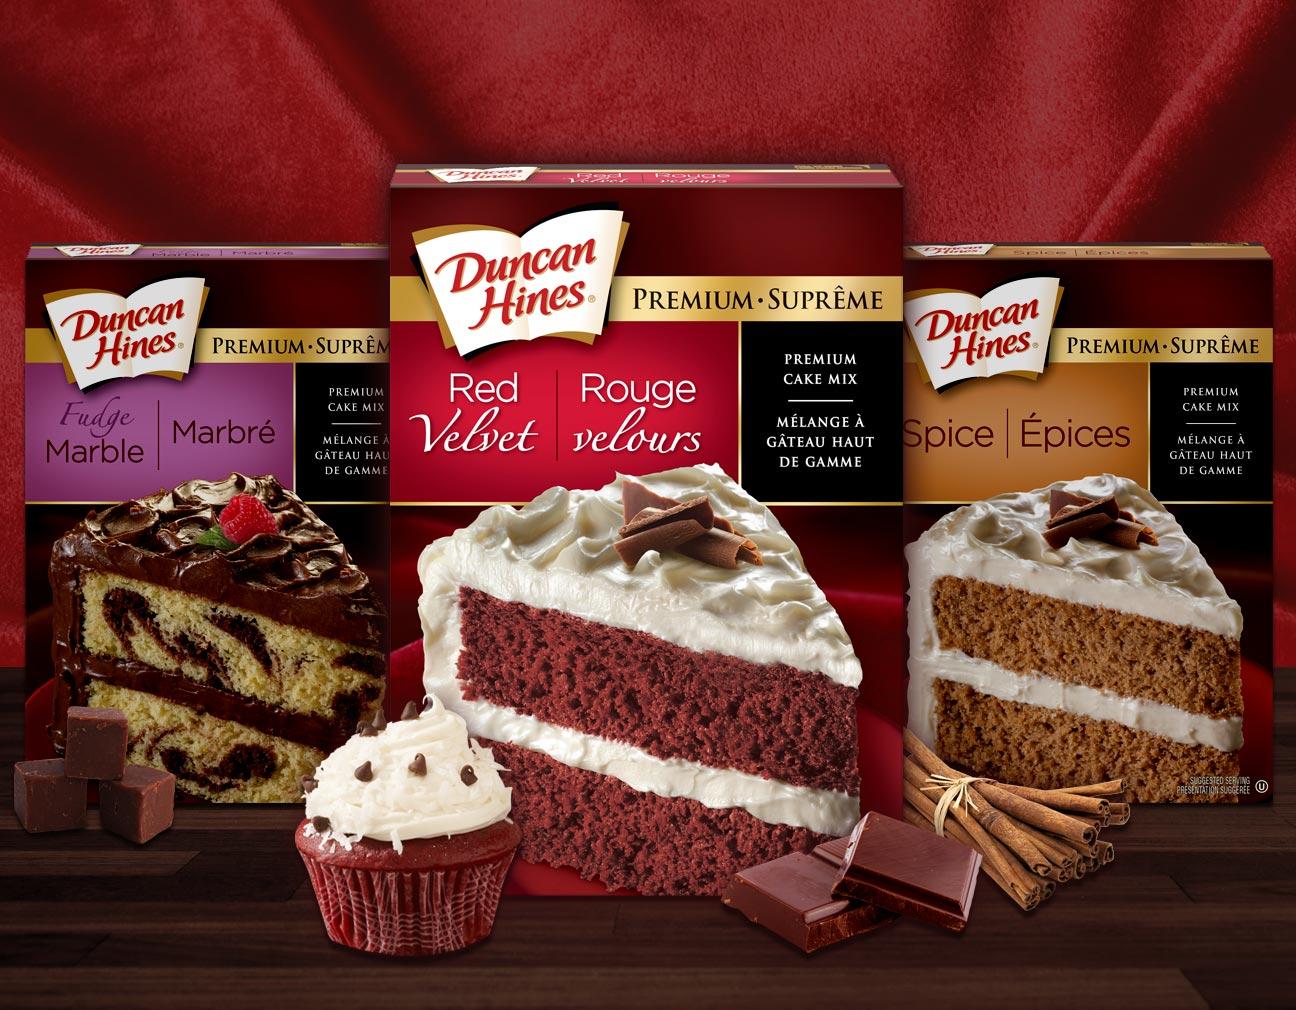 Duncan Hines cake mixes OU kosher certification